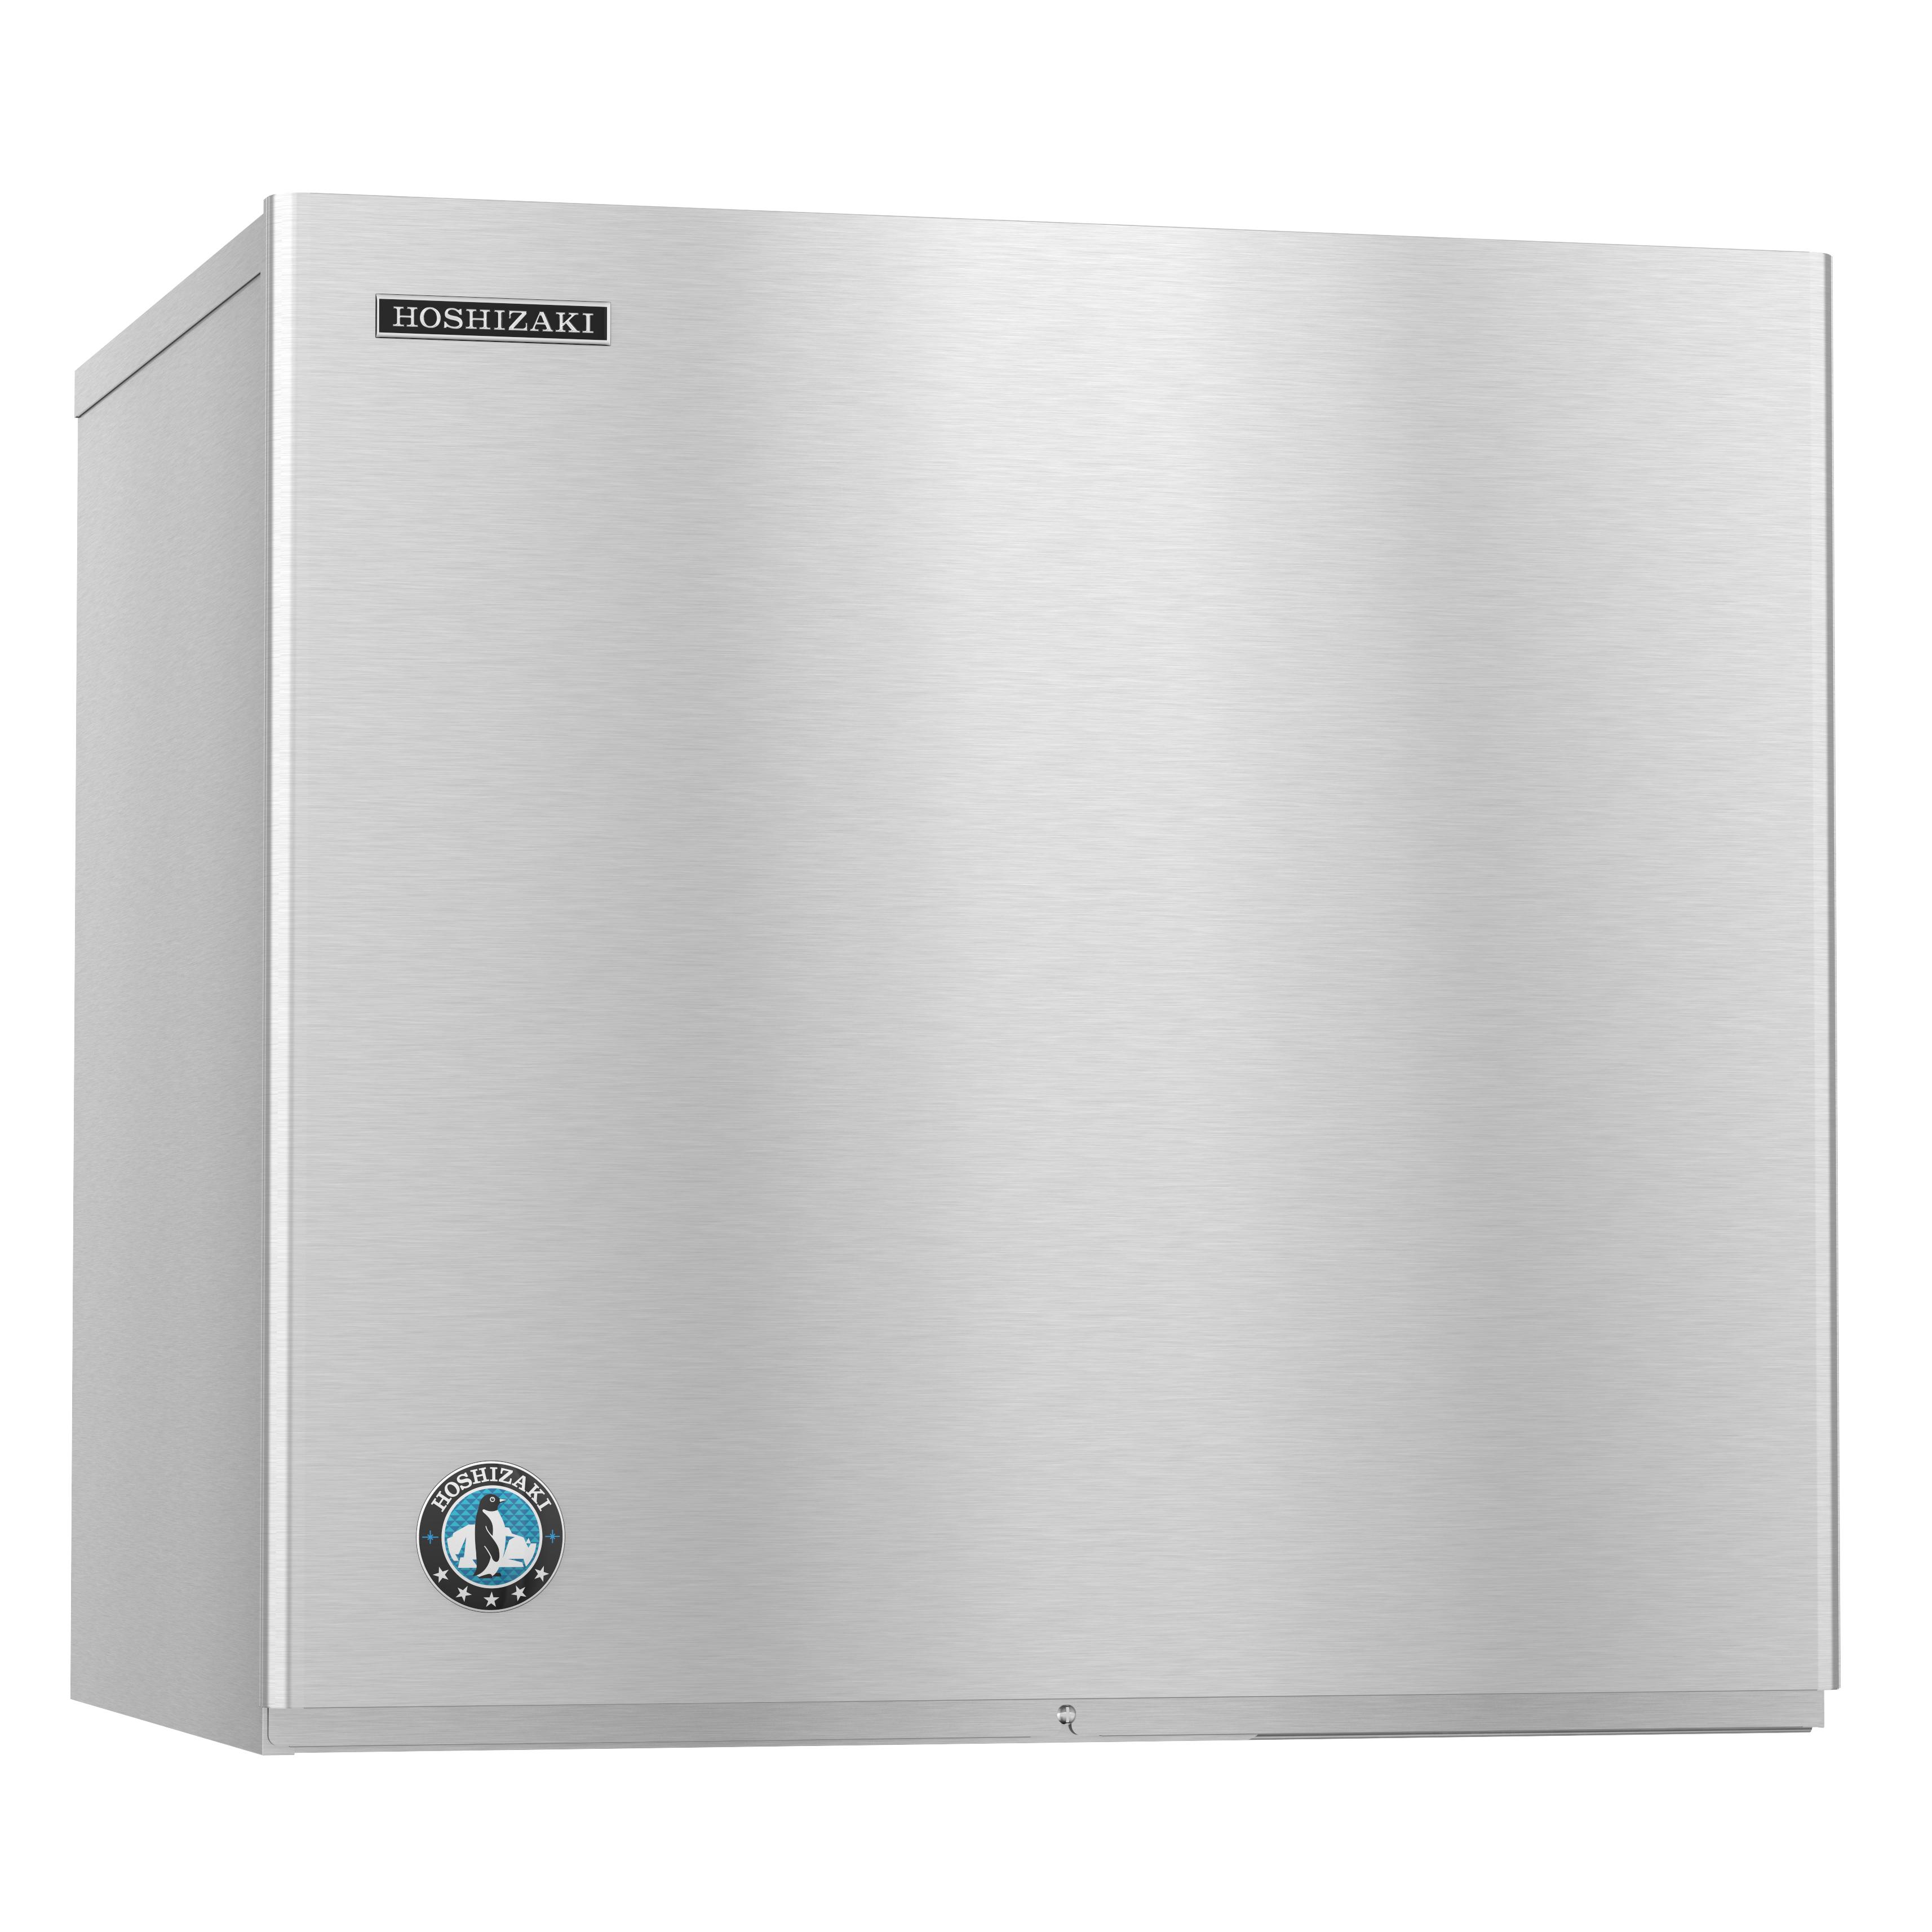 Hoshizaki KMD-860MWJ ice cubers, ice storage & ice dispensers